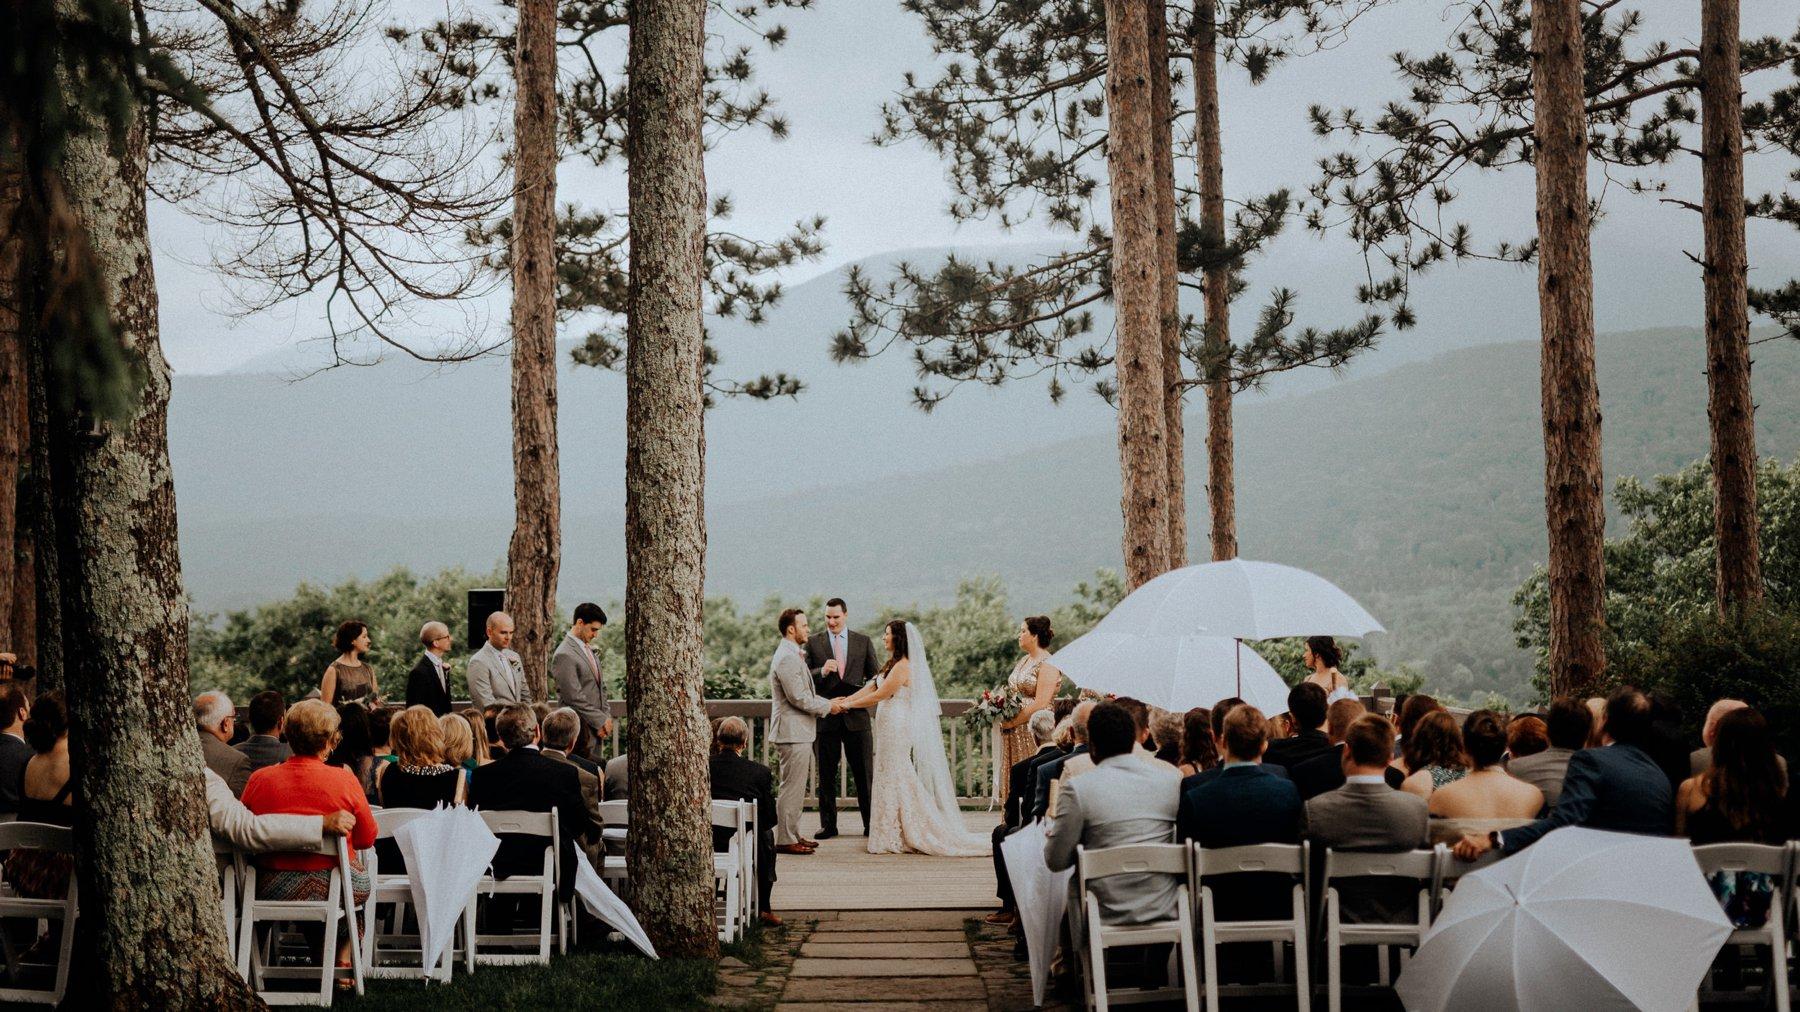 058-034-Onteora-Mountain-House-wedding-photographer-94.jpg